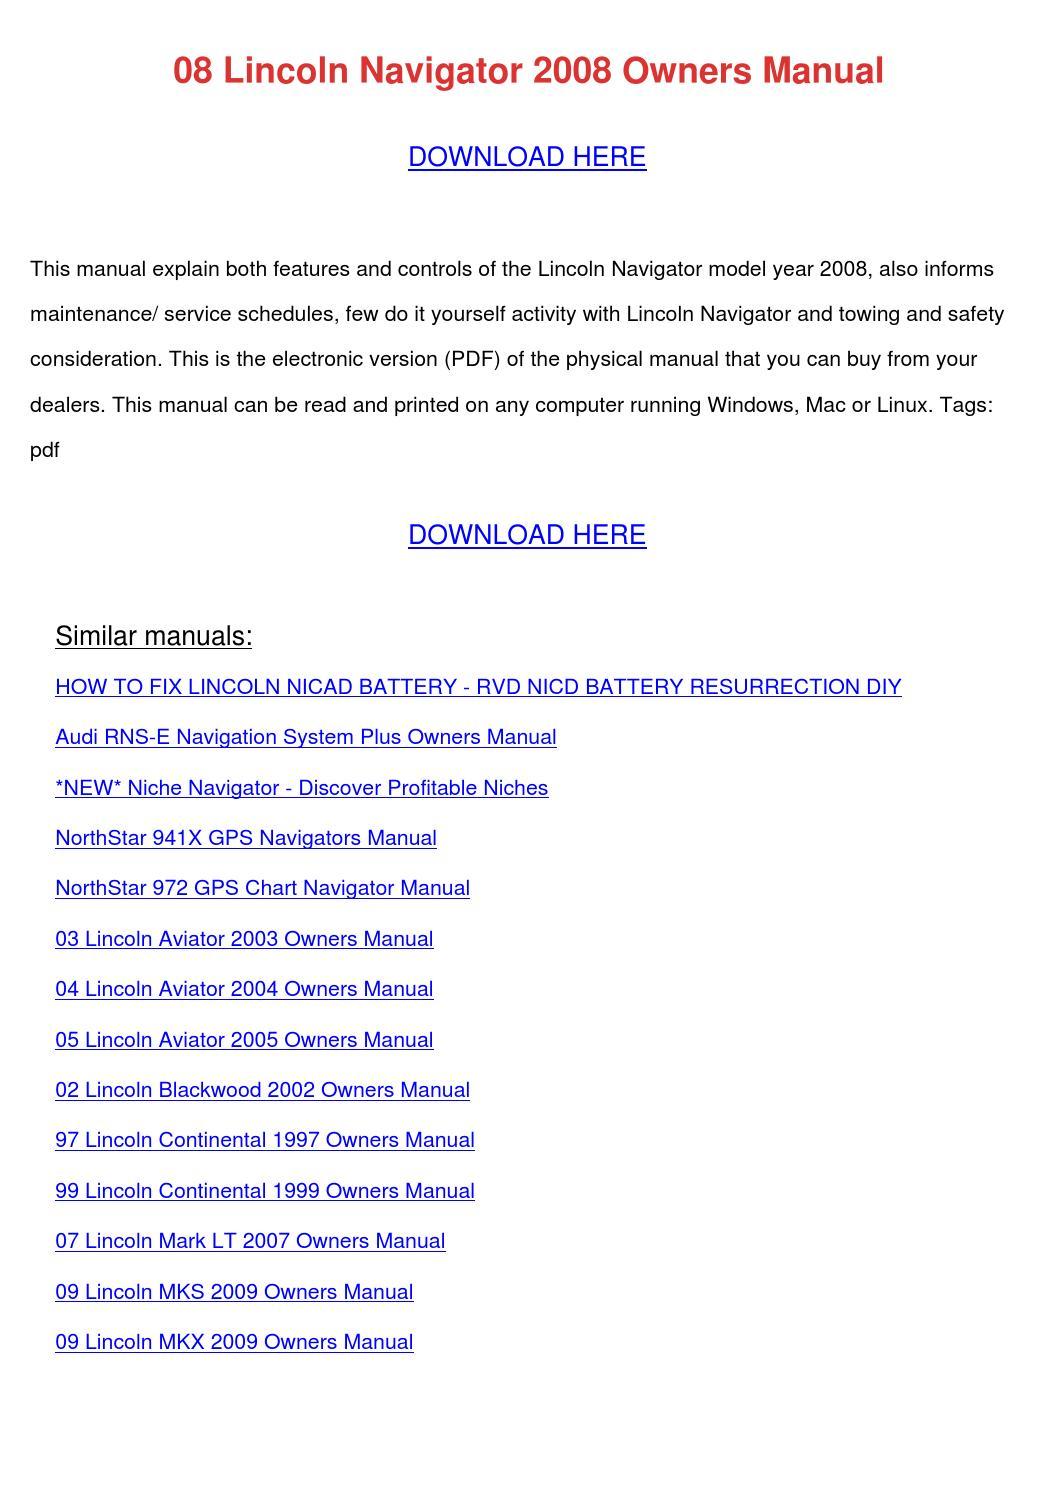 08 Lincoln Navigator 2008 Owners Manual by JasminHagen - issuu